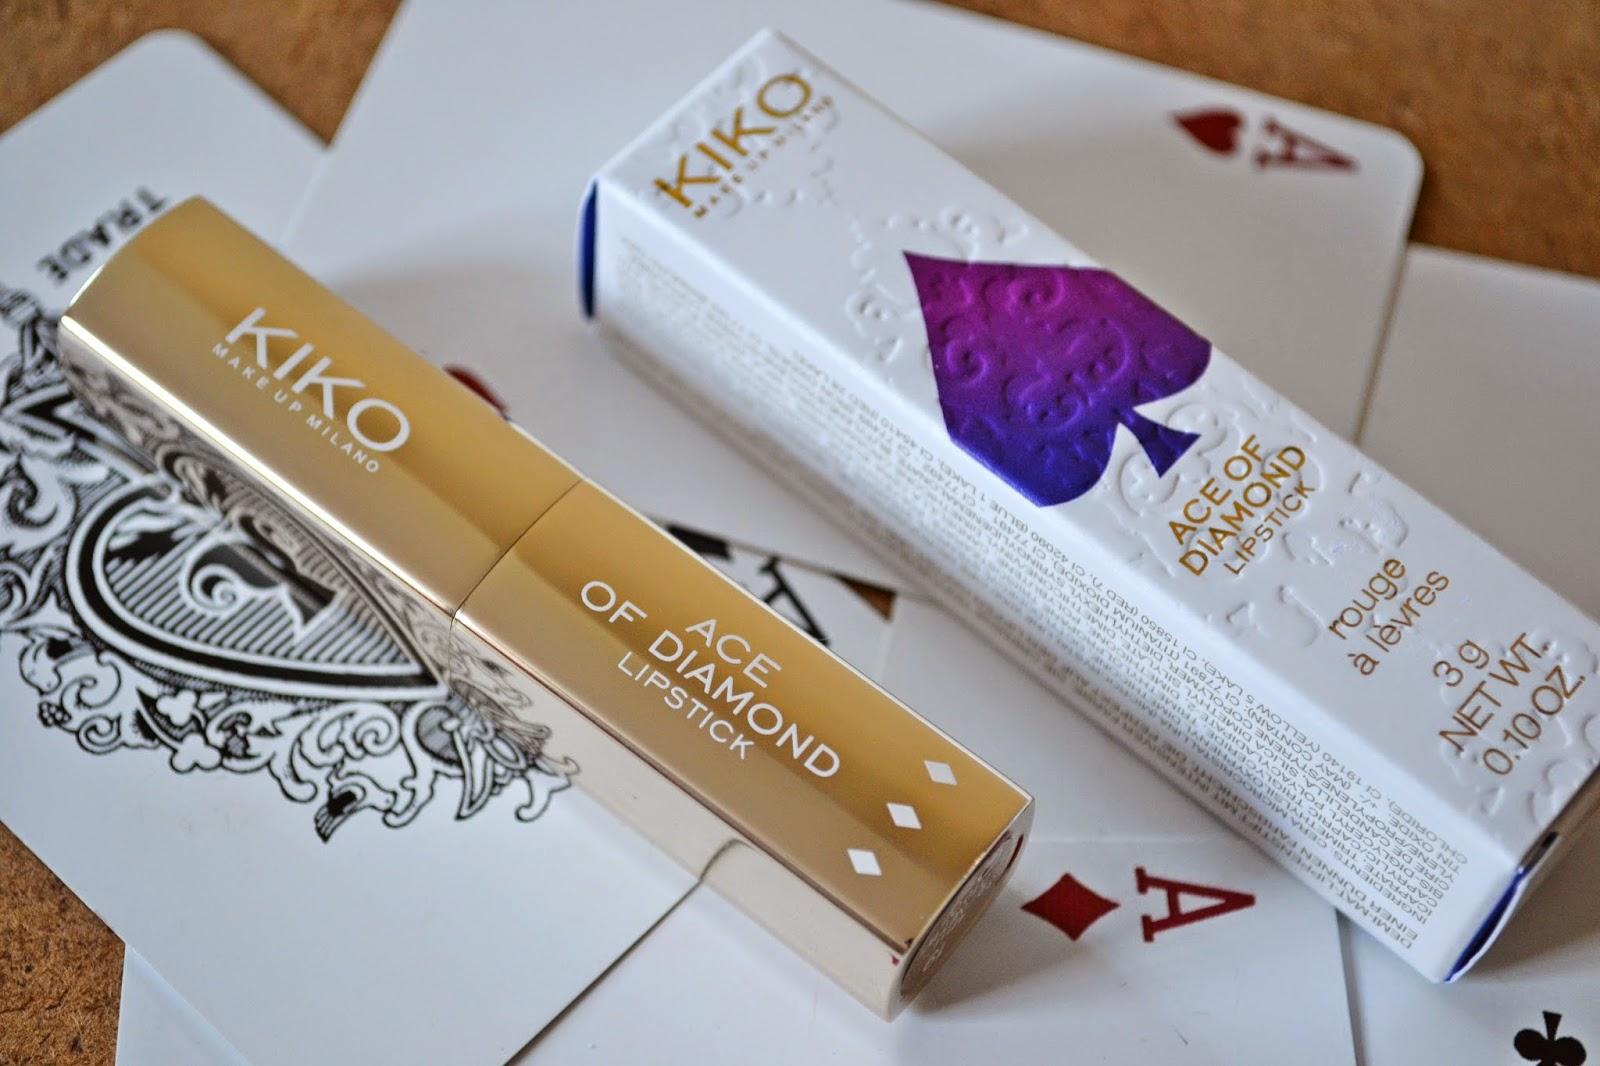 KIKO Make Up Milano Ace of Diamond Lipstick 19 Hypnotic Coral - Aspiring Londoner